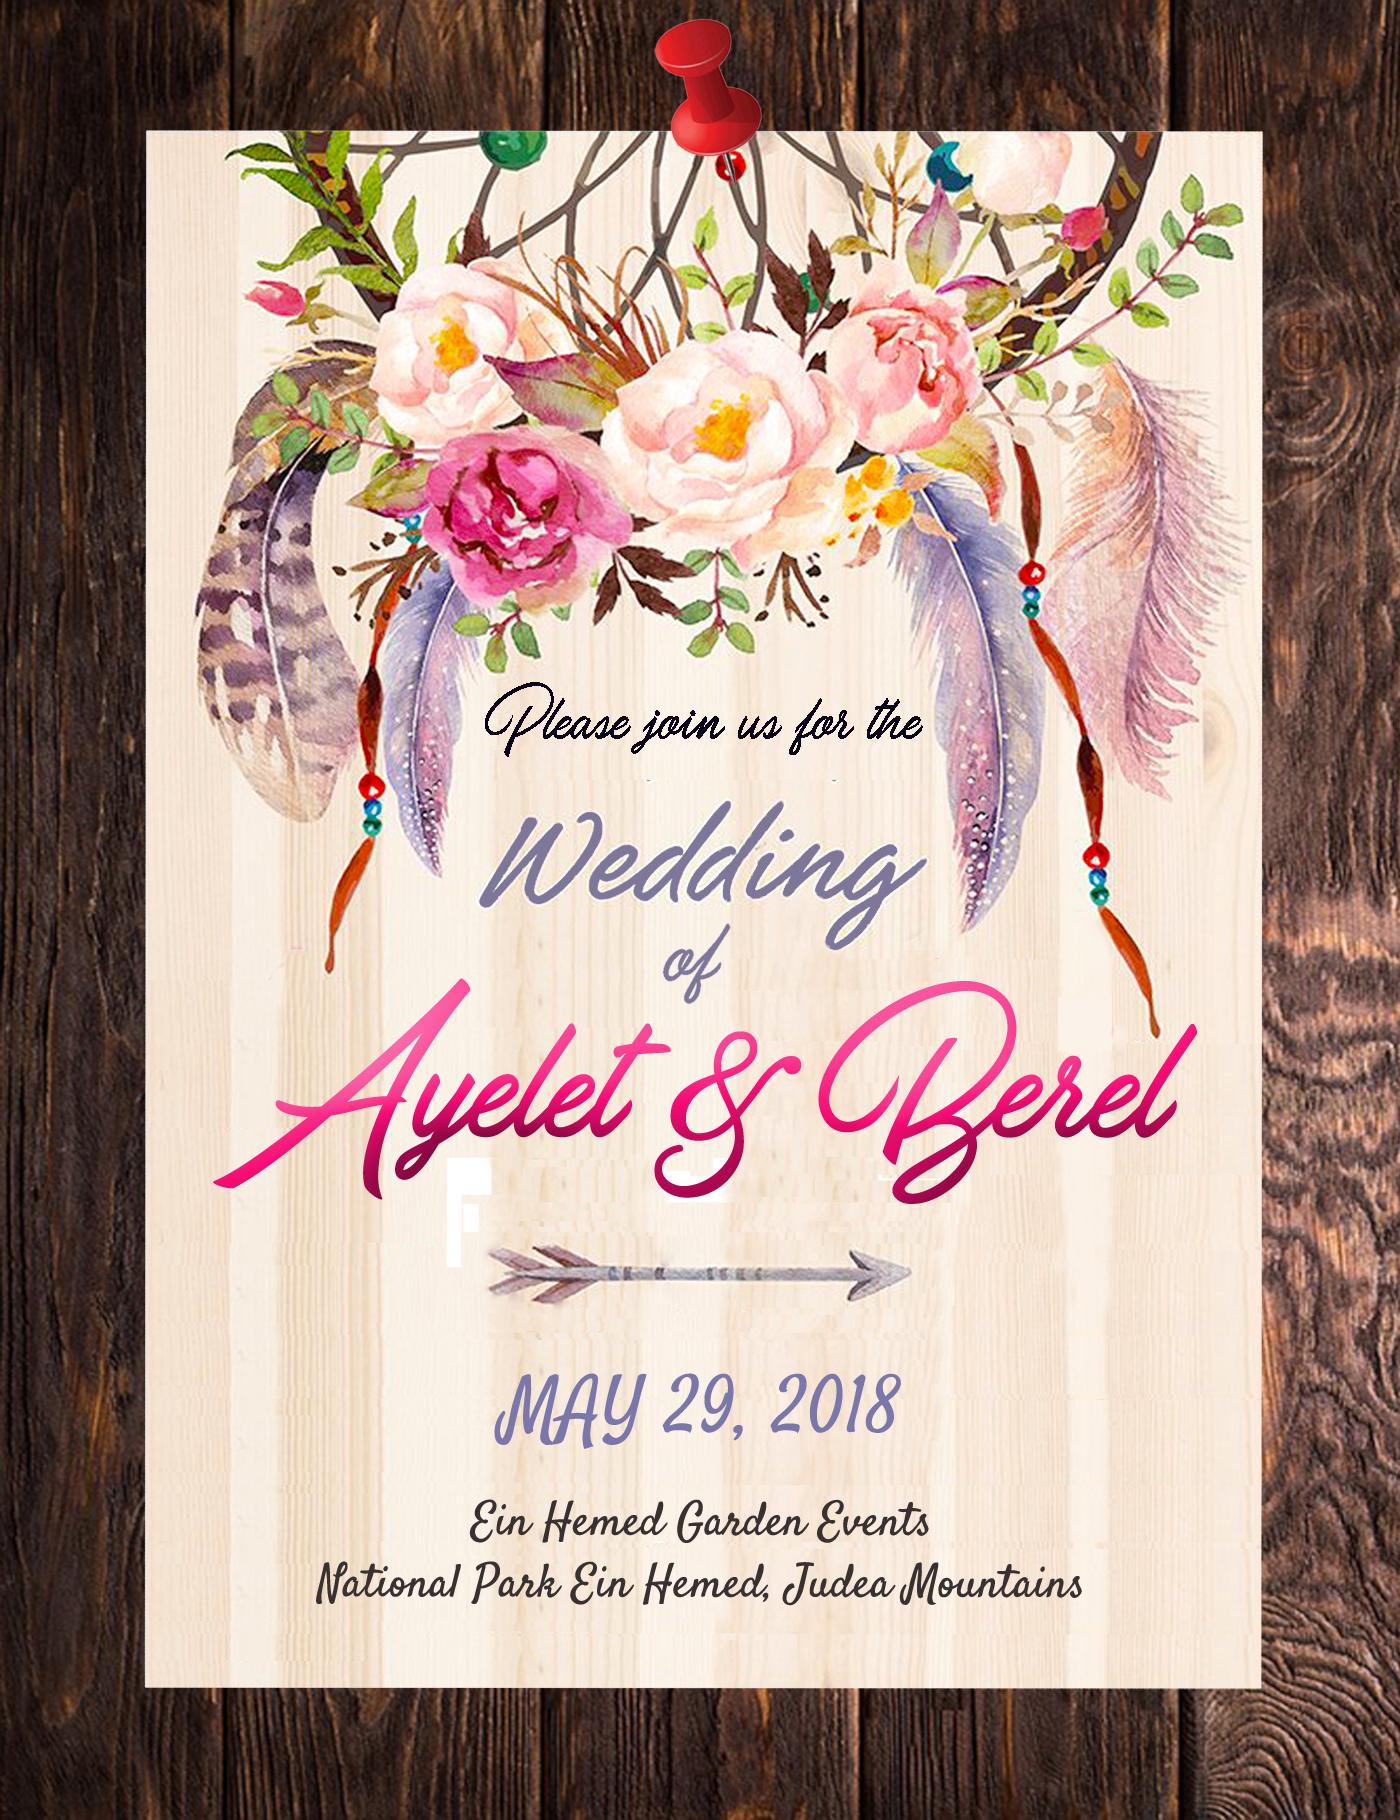 Ayelet and Berl invite good